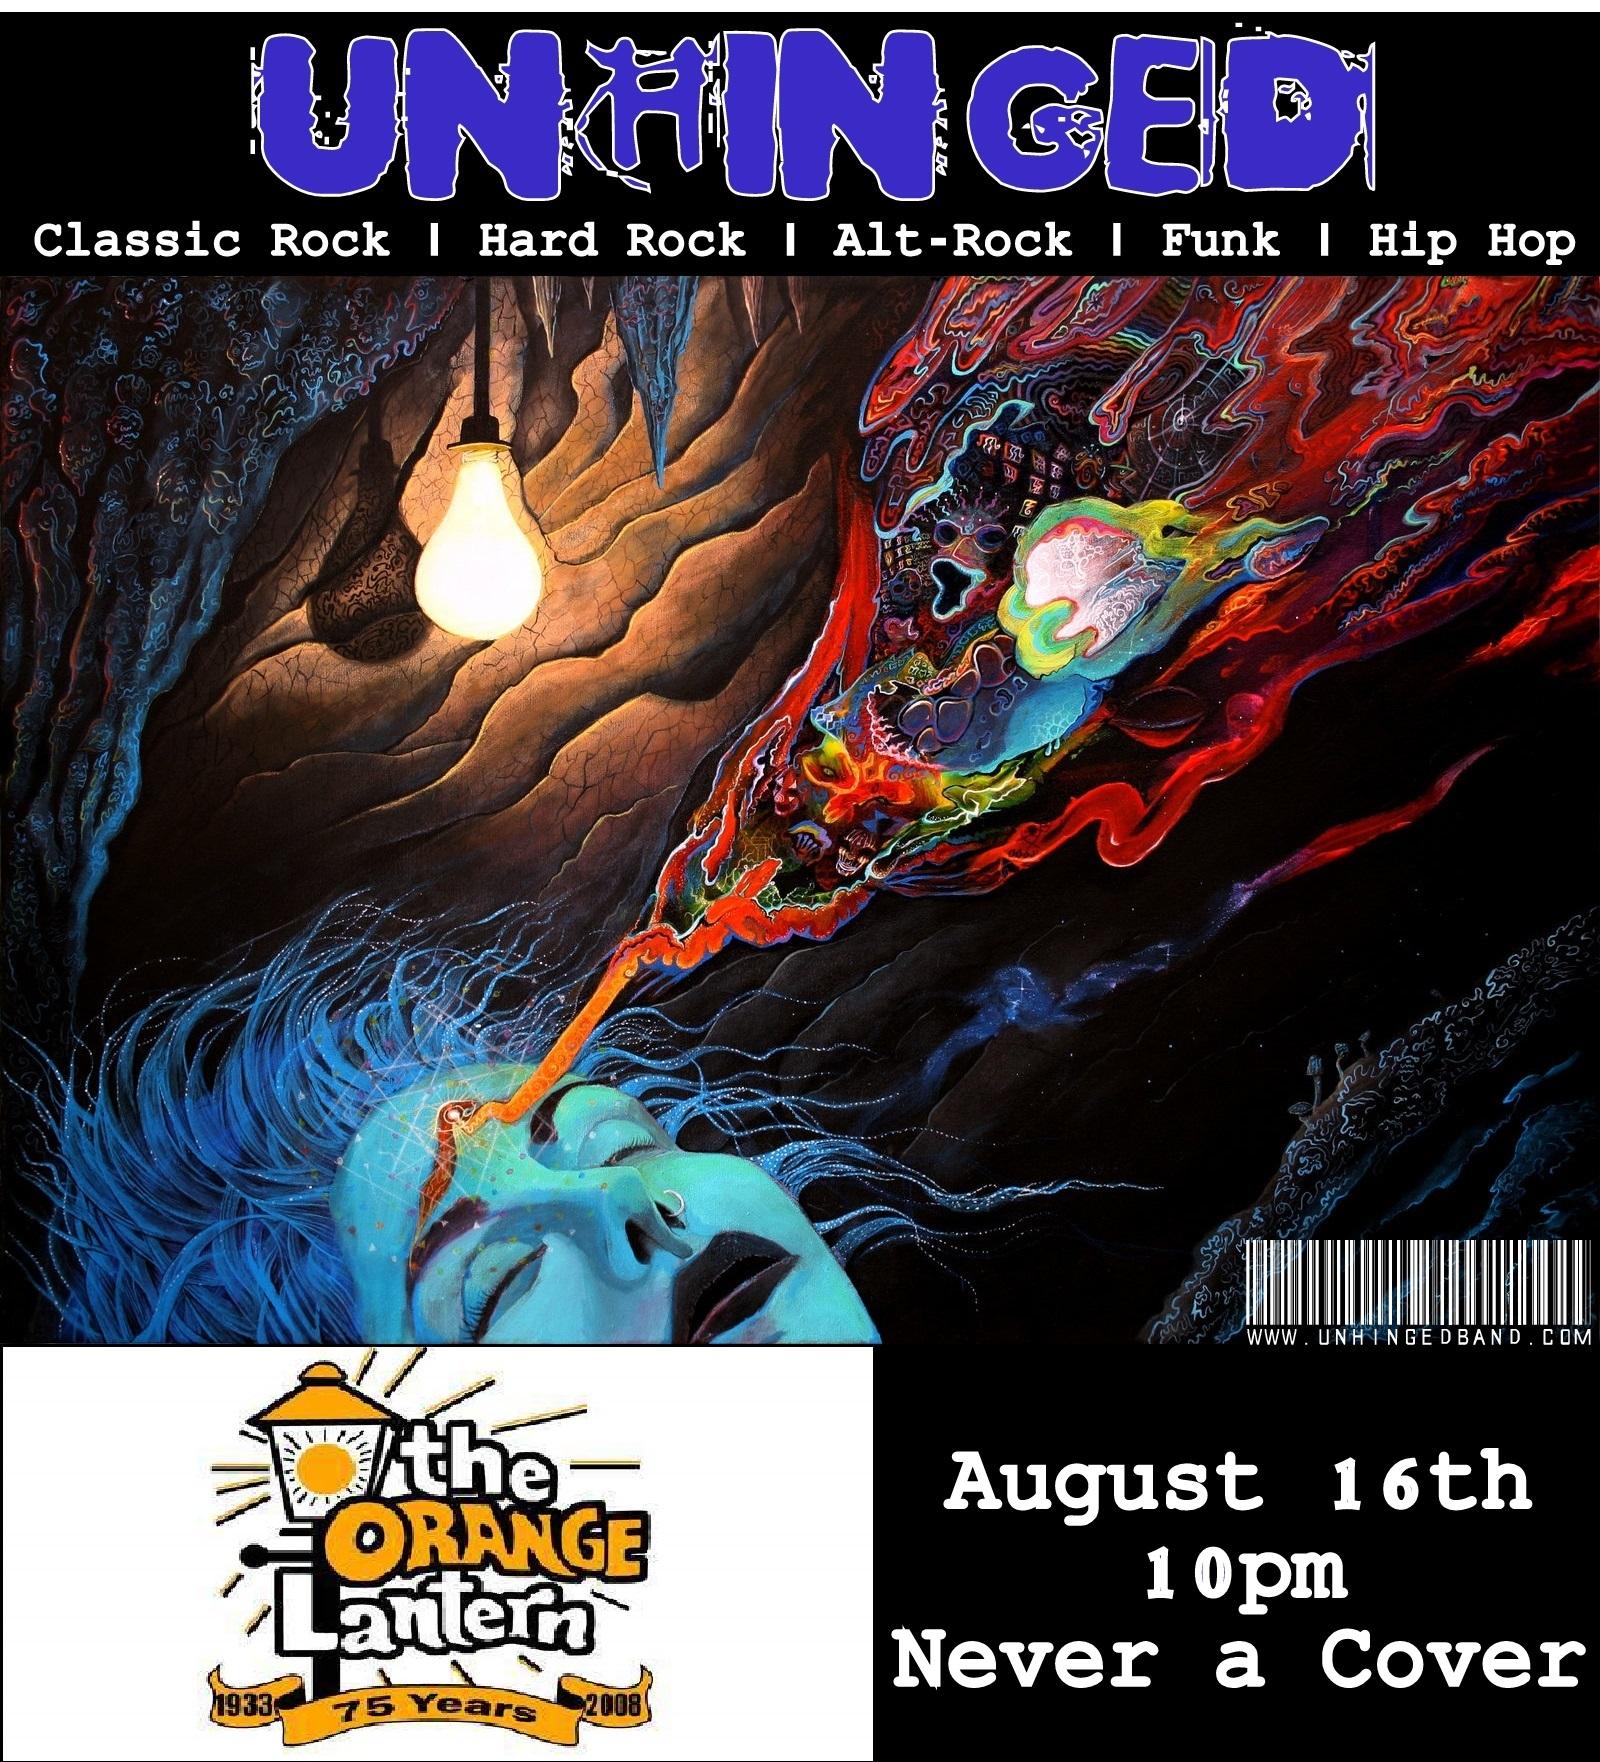 Live at The Orange Lantern   August 16th   10pm